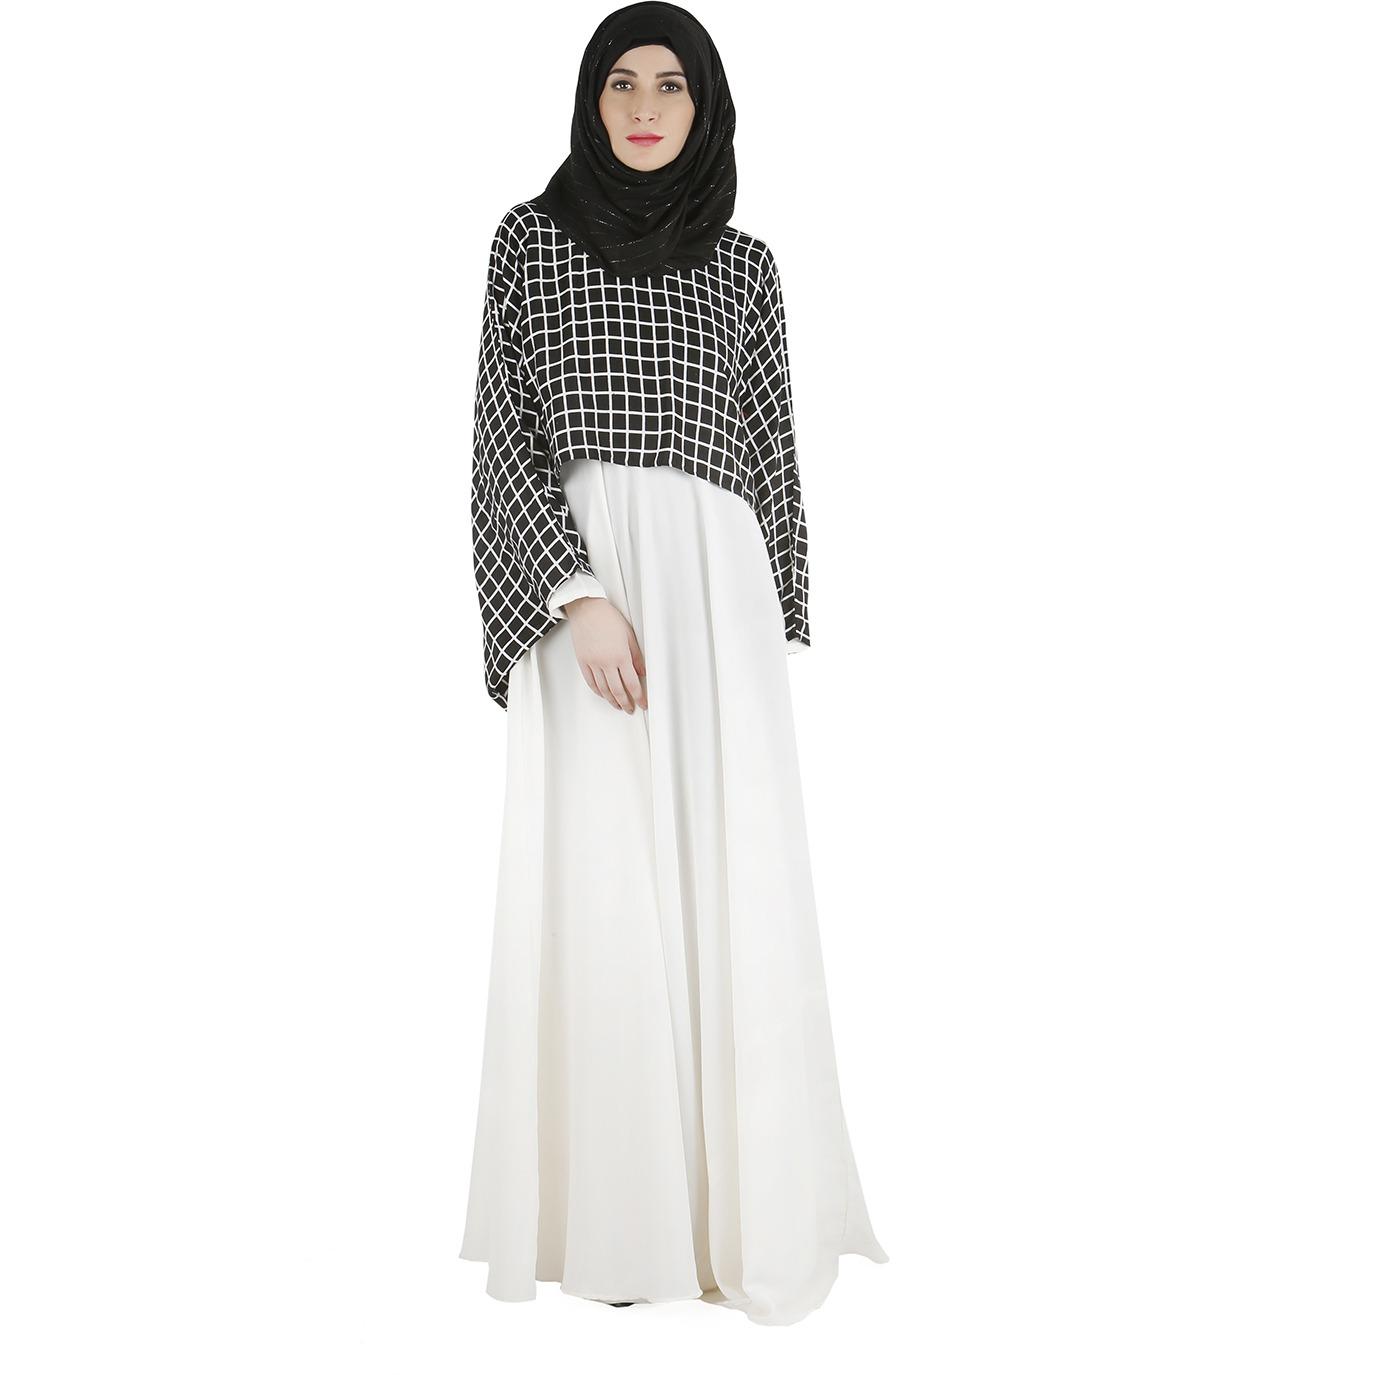 fb73489f0bb29 Modest Maxi Skirts And Dresses | Saddha